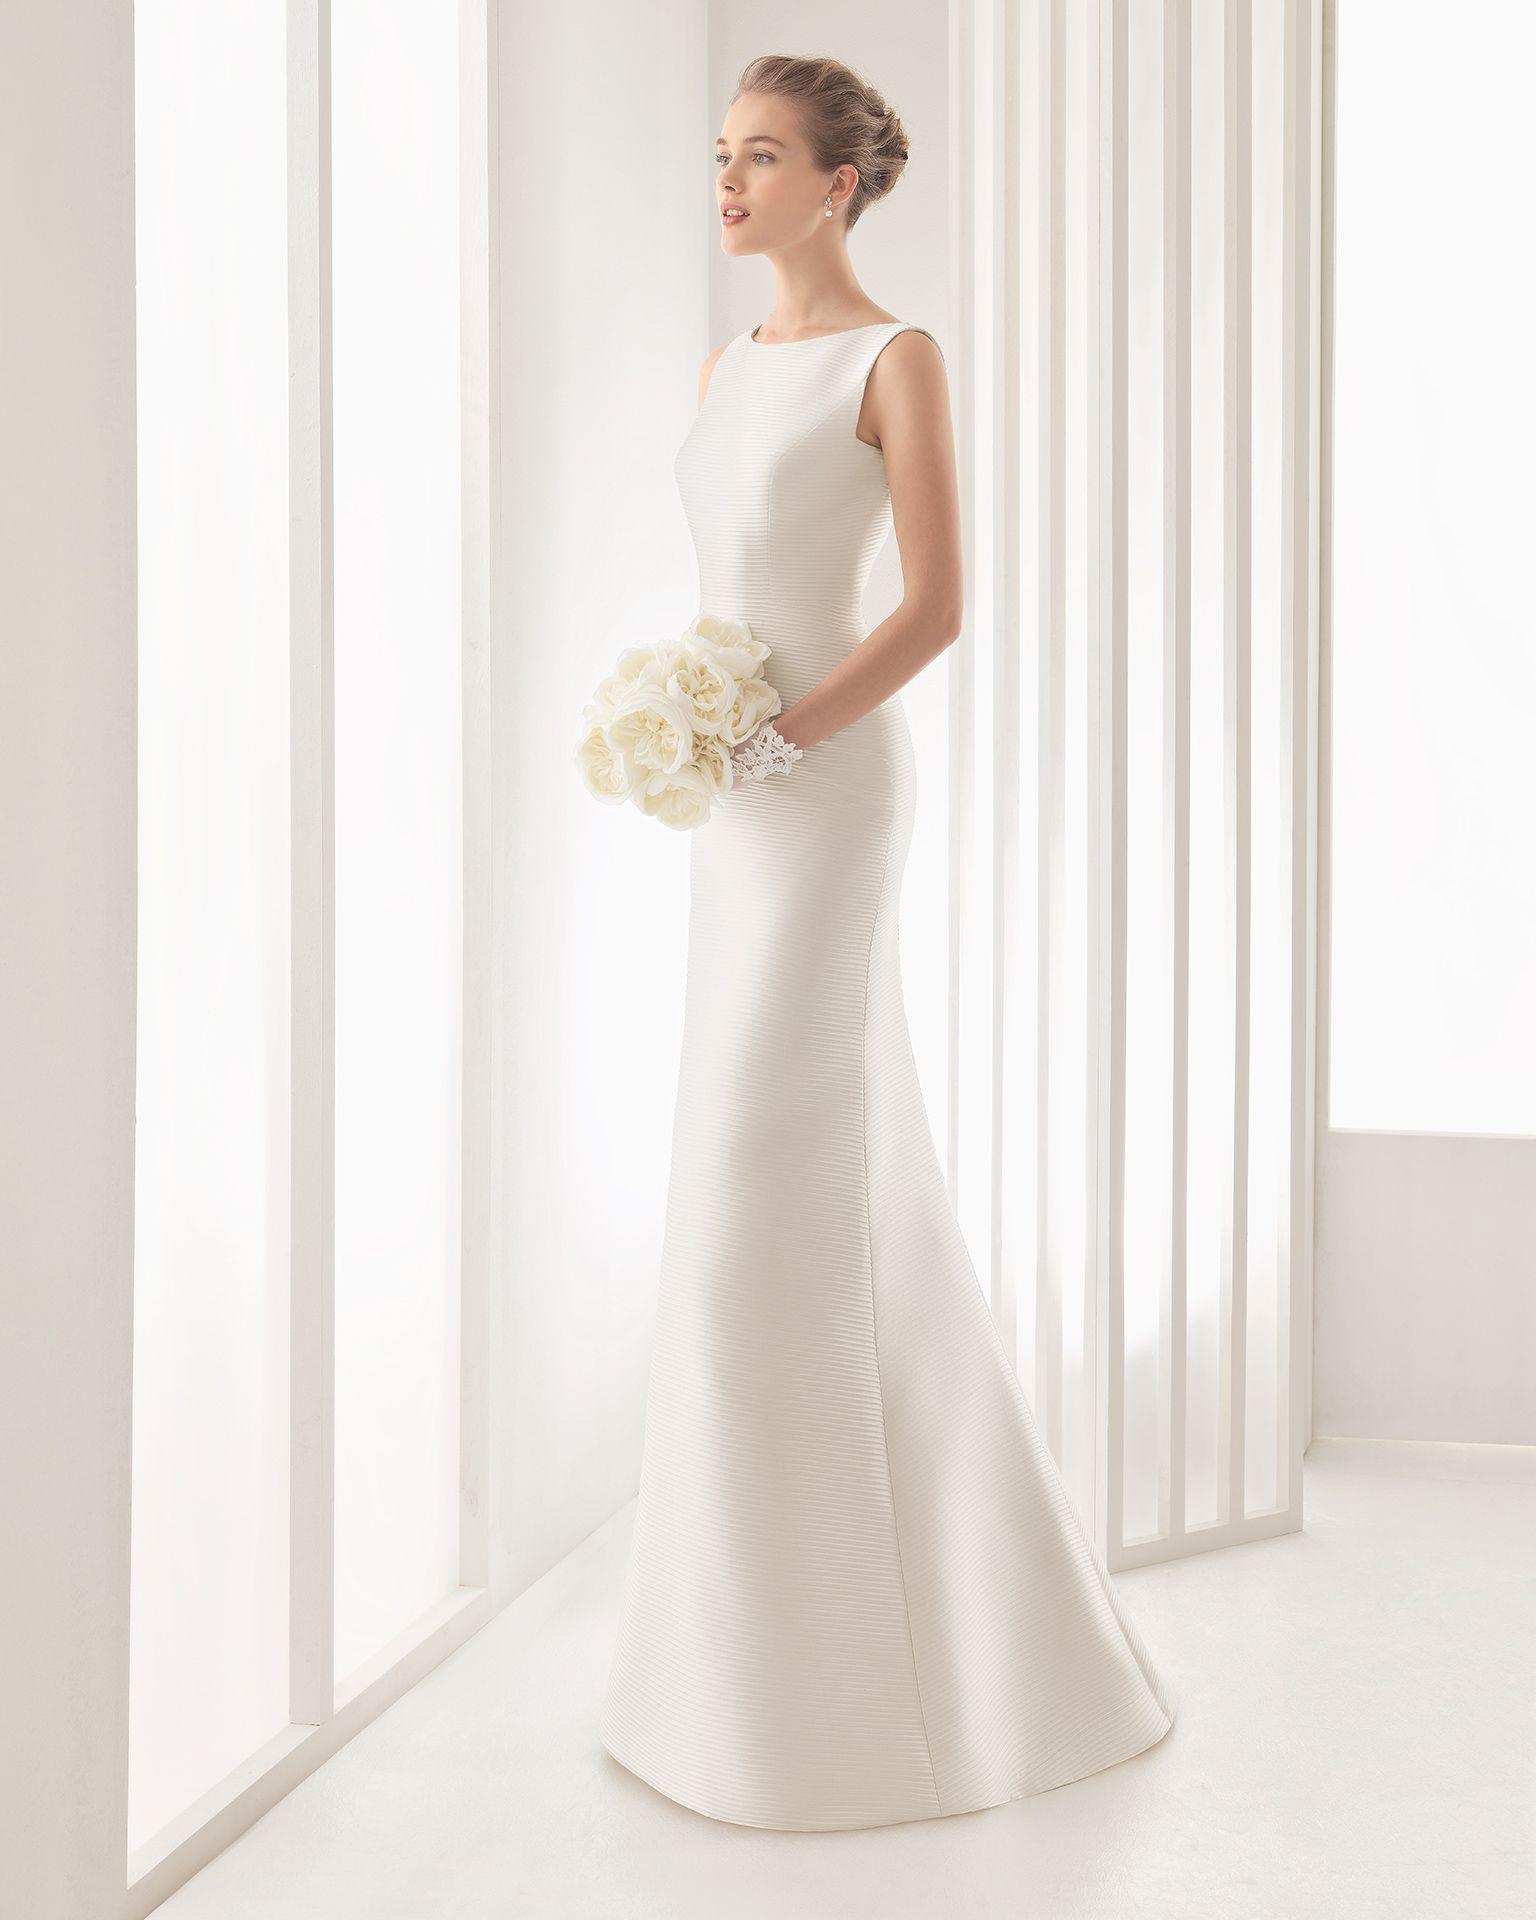 Navar - 2017 Bridal Collection. Rosa Clará. | Wedding dress, Luxe ...